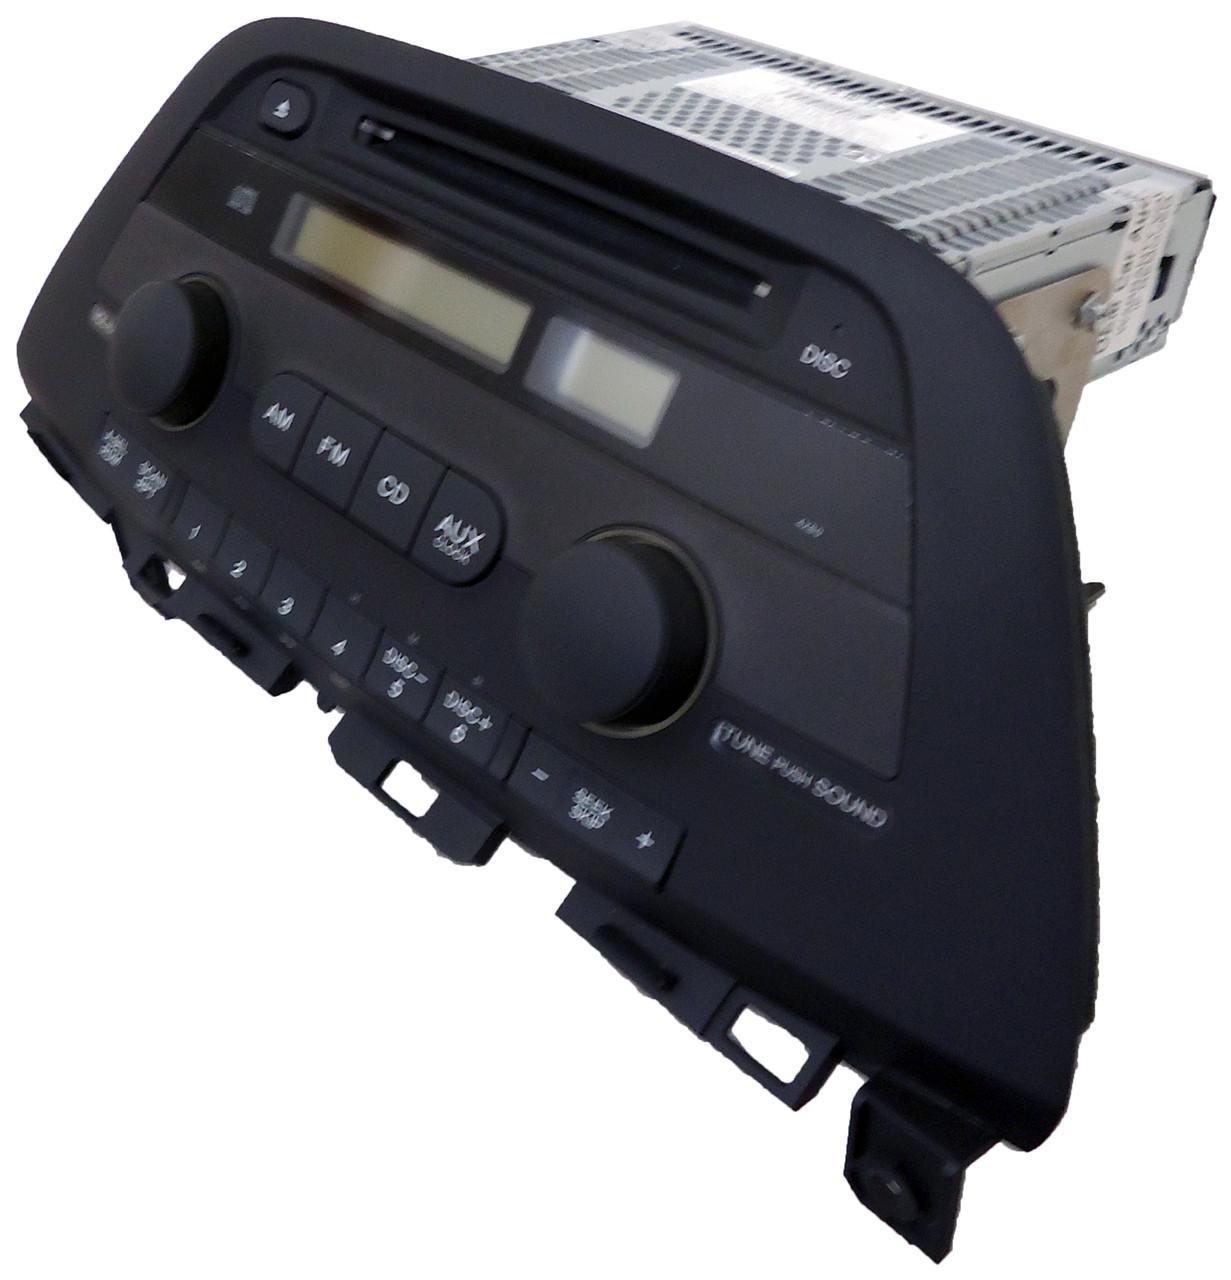 05 06 07 Honda ODYSSEY Radio AUX Input CD Disc Player